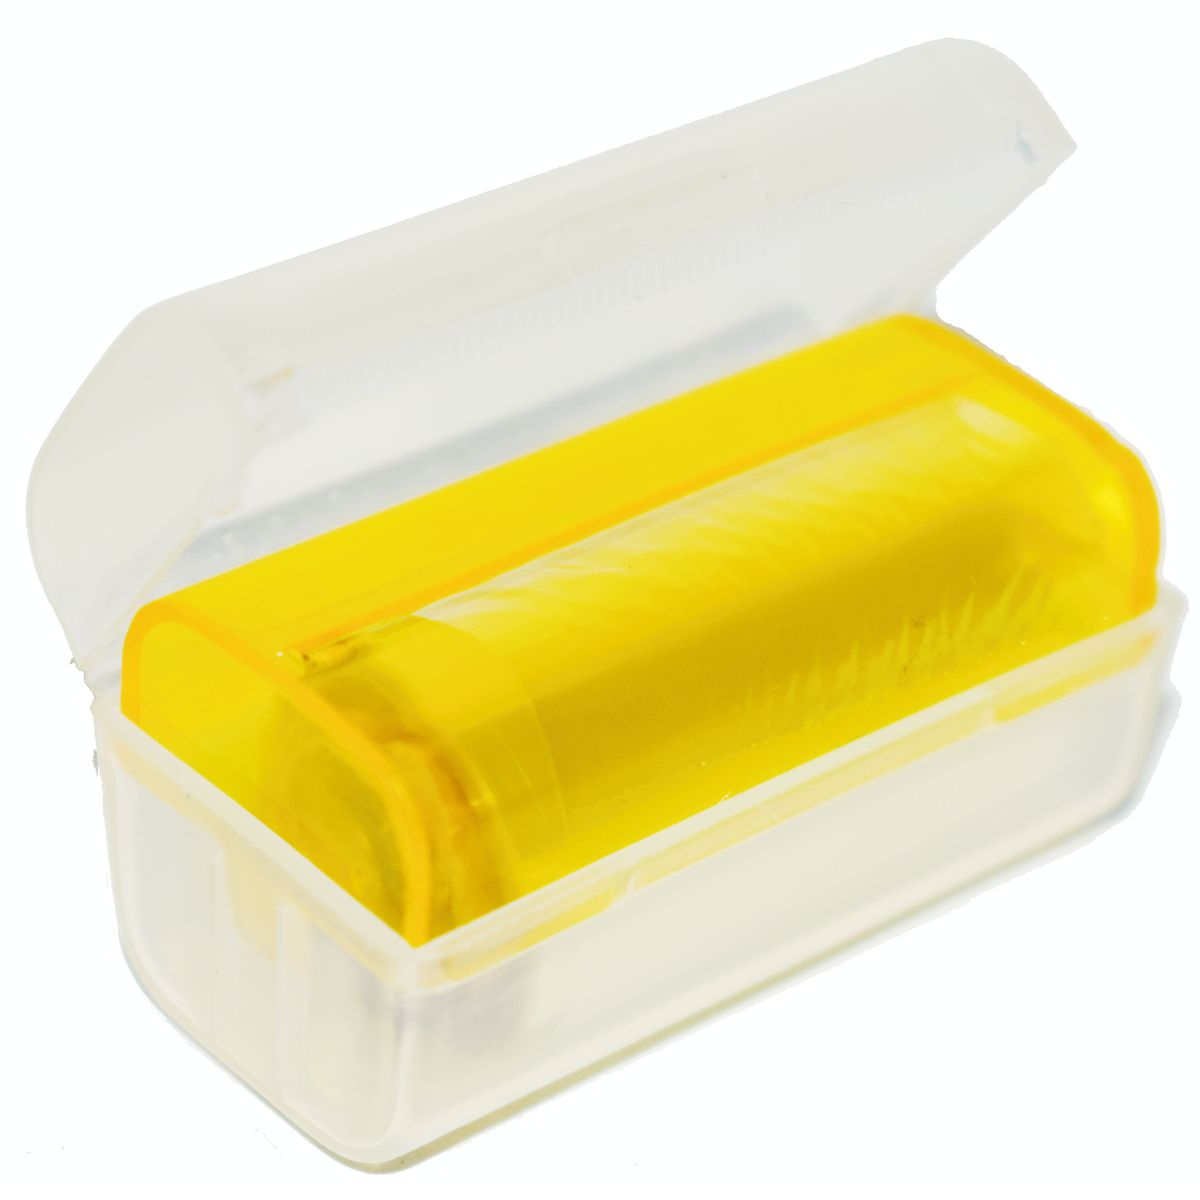 ultraeco rolls celulosa papel